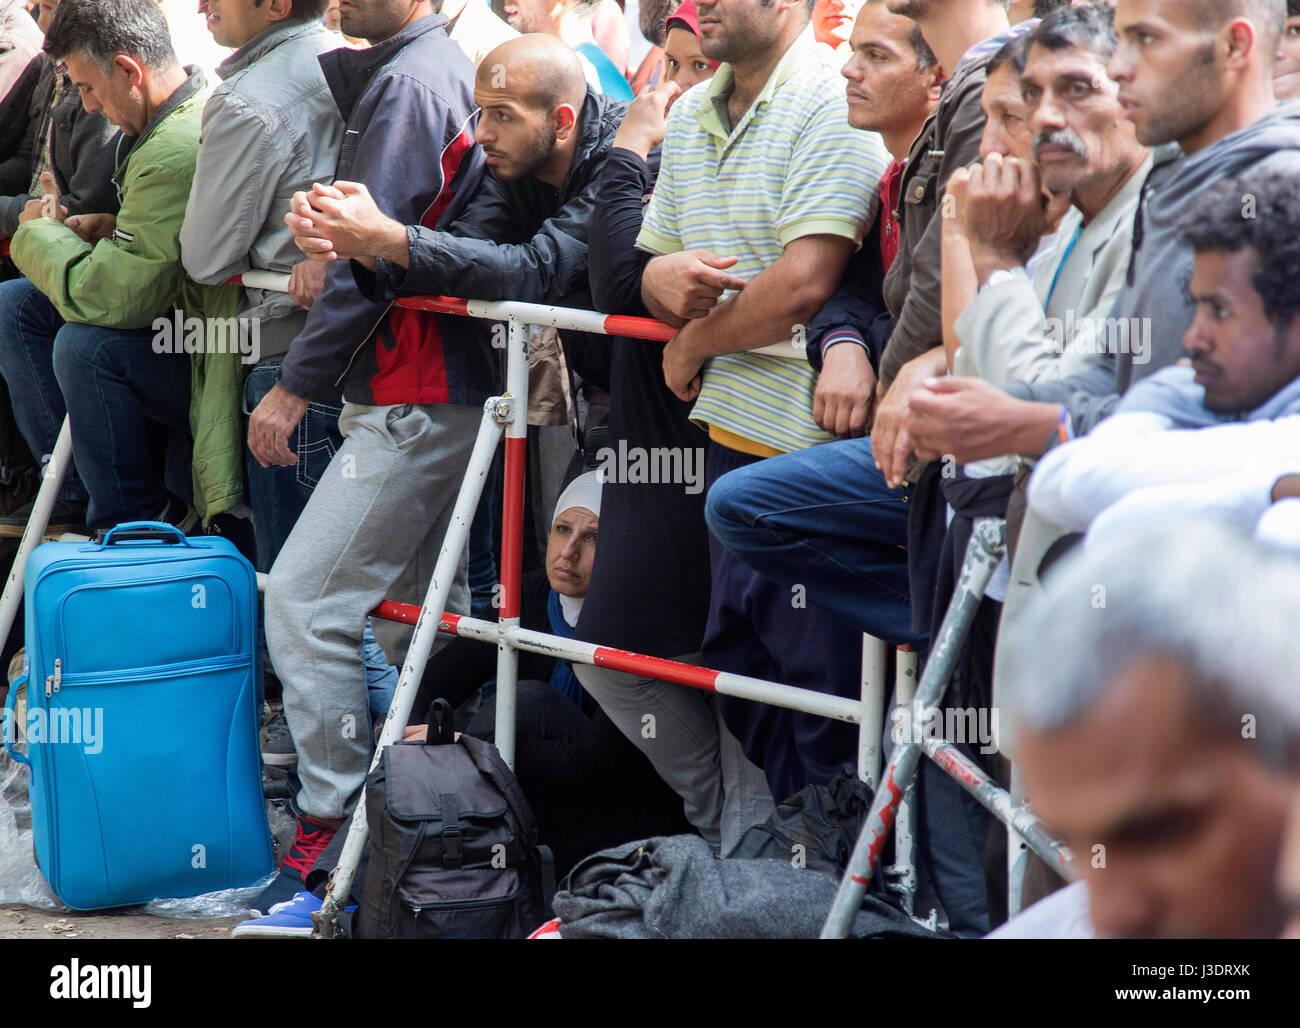 Asylum seeking refugees in Berlin, 2015 Stock Photo